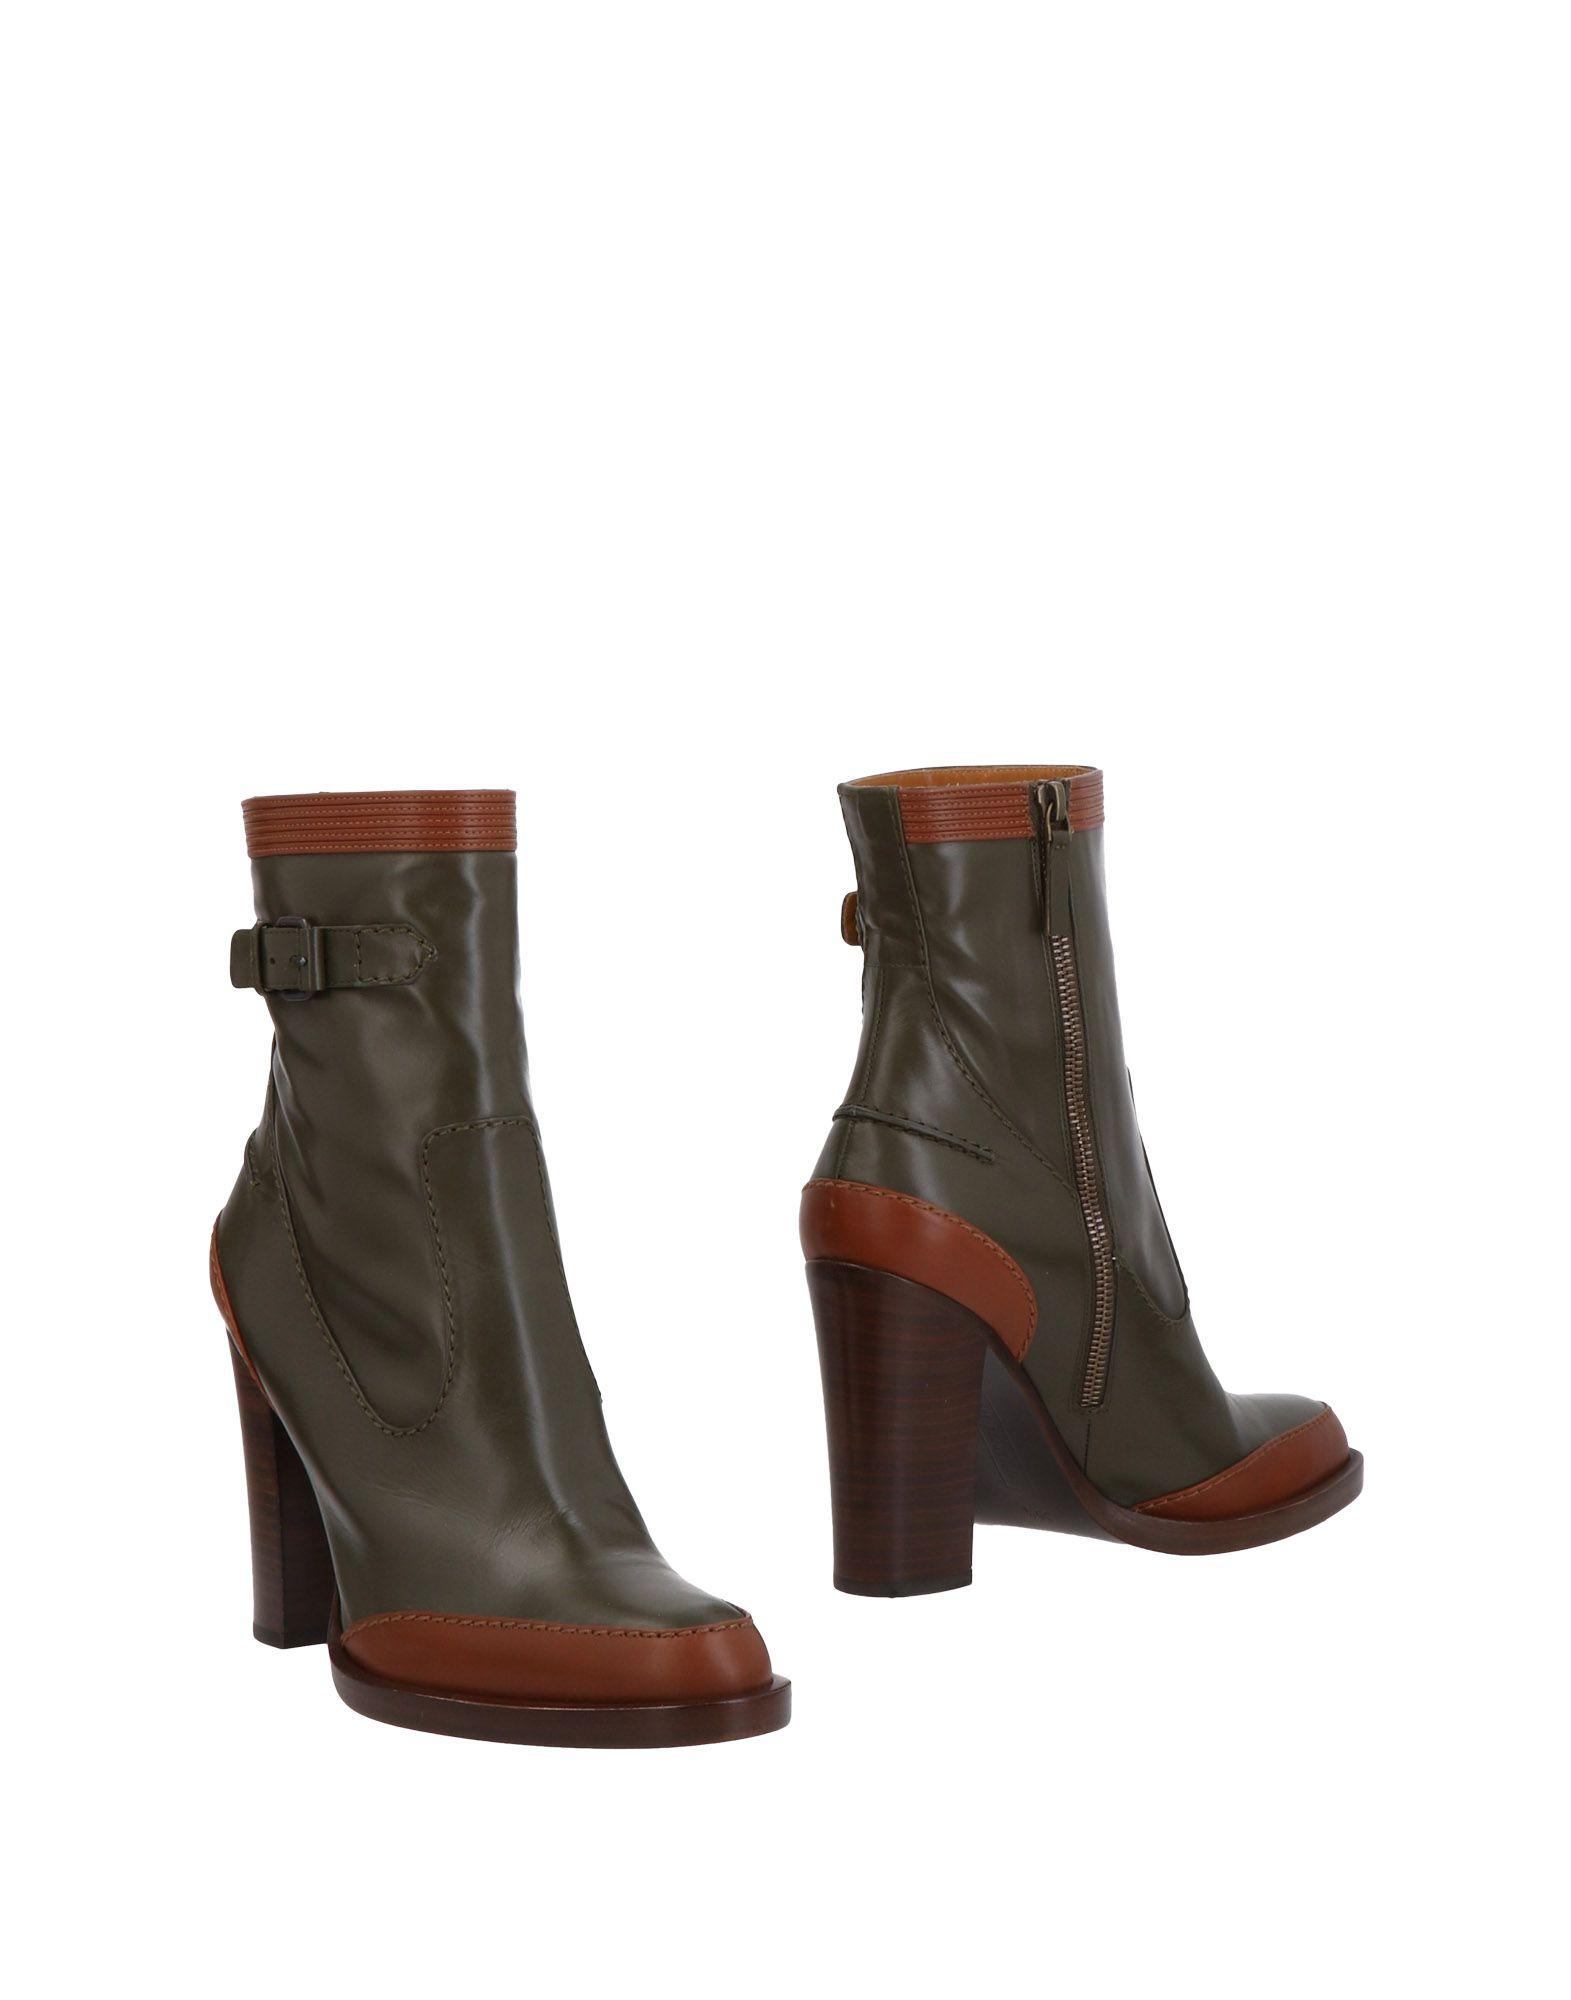 Rabatt Schuhe  Veronique Branquinho Stiefelette Damen  Schuhe 11464065OX 4e6ea6